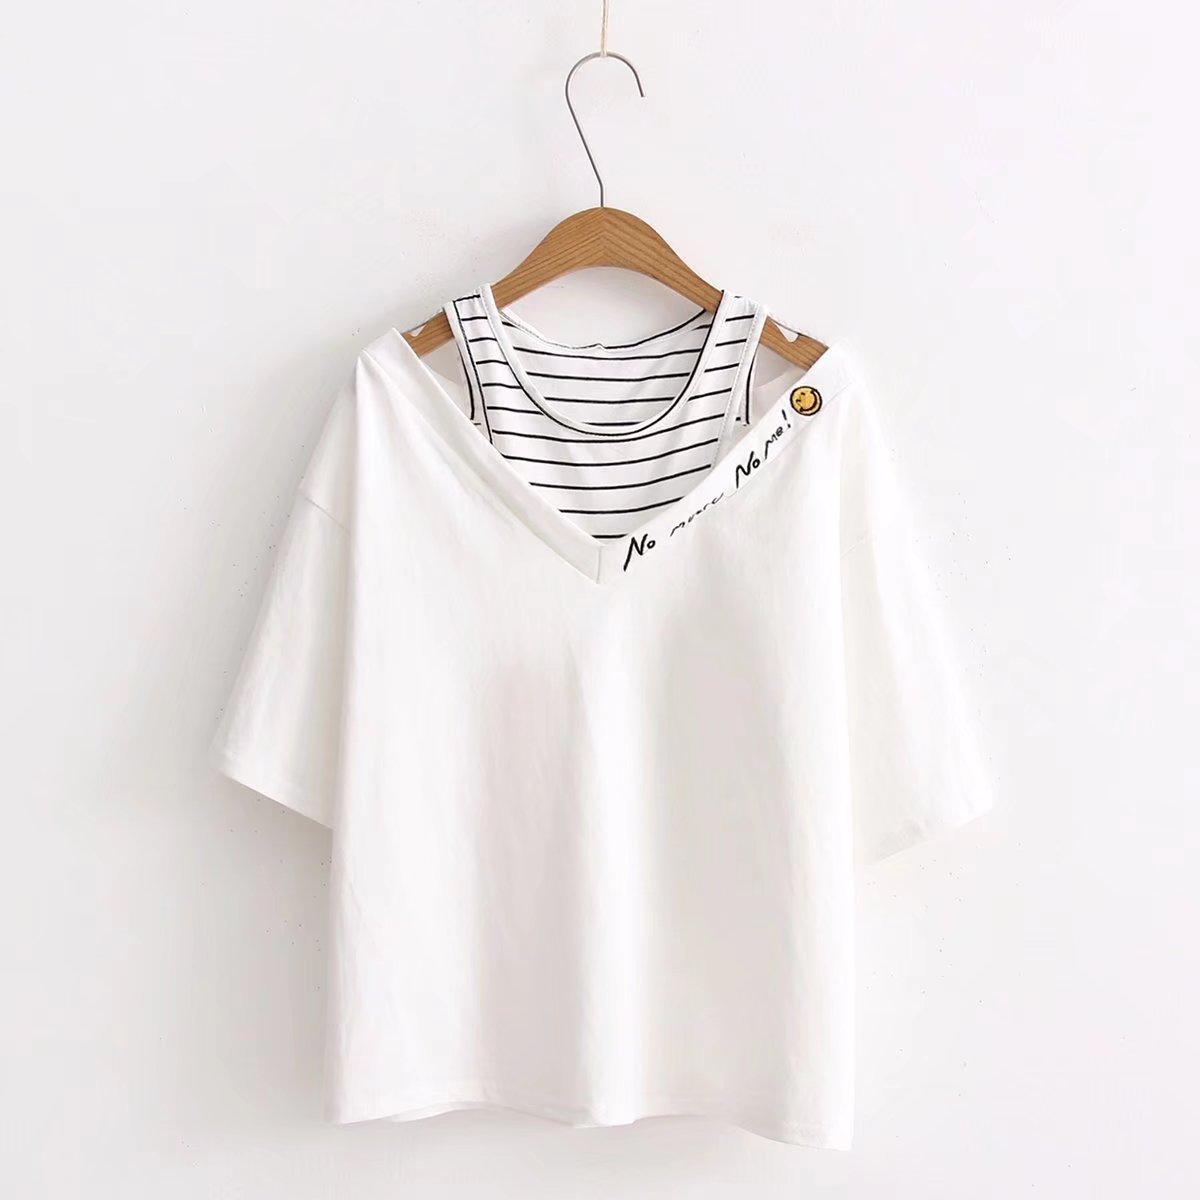 New  Fashion T Shirt Women Funny T-shirts Print Summer  Women 2020 Clothing